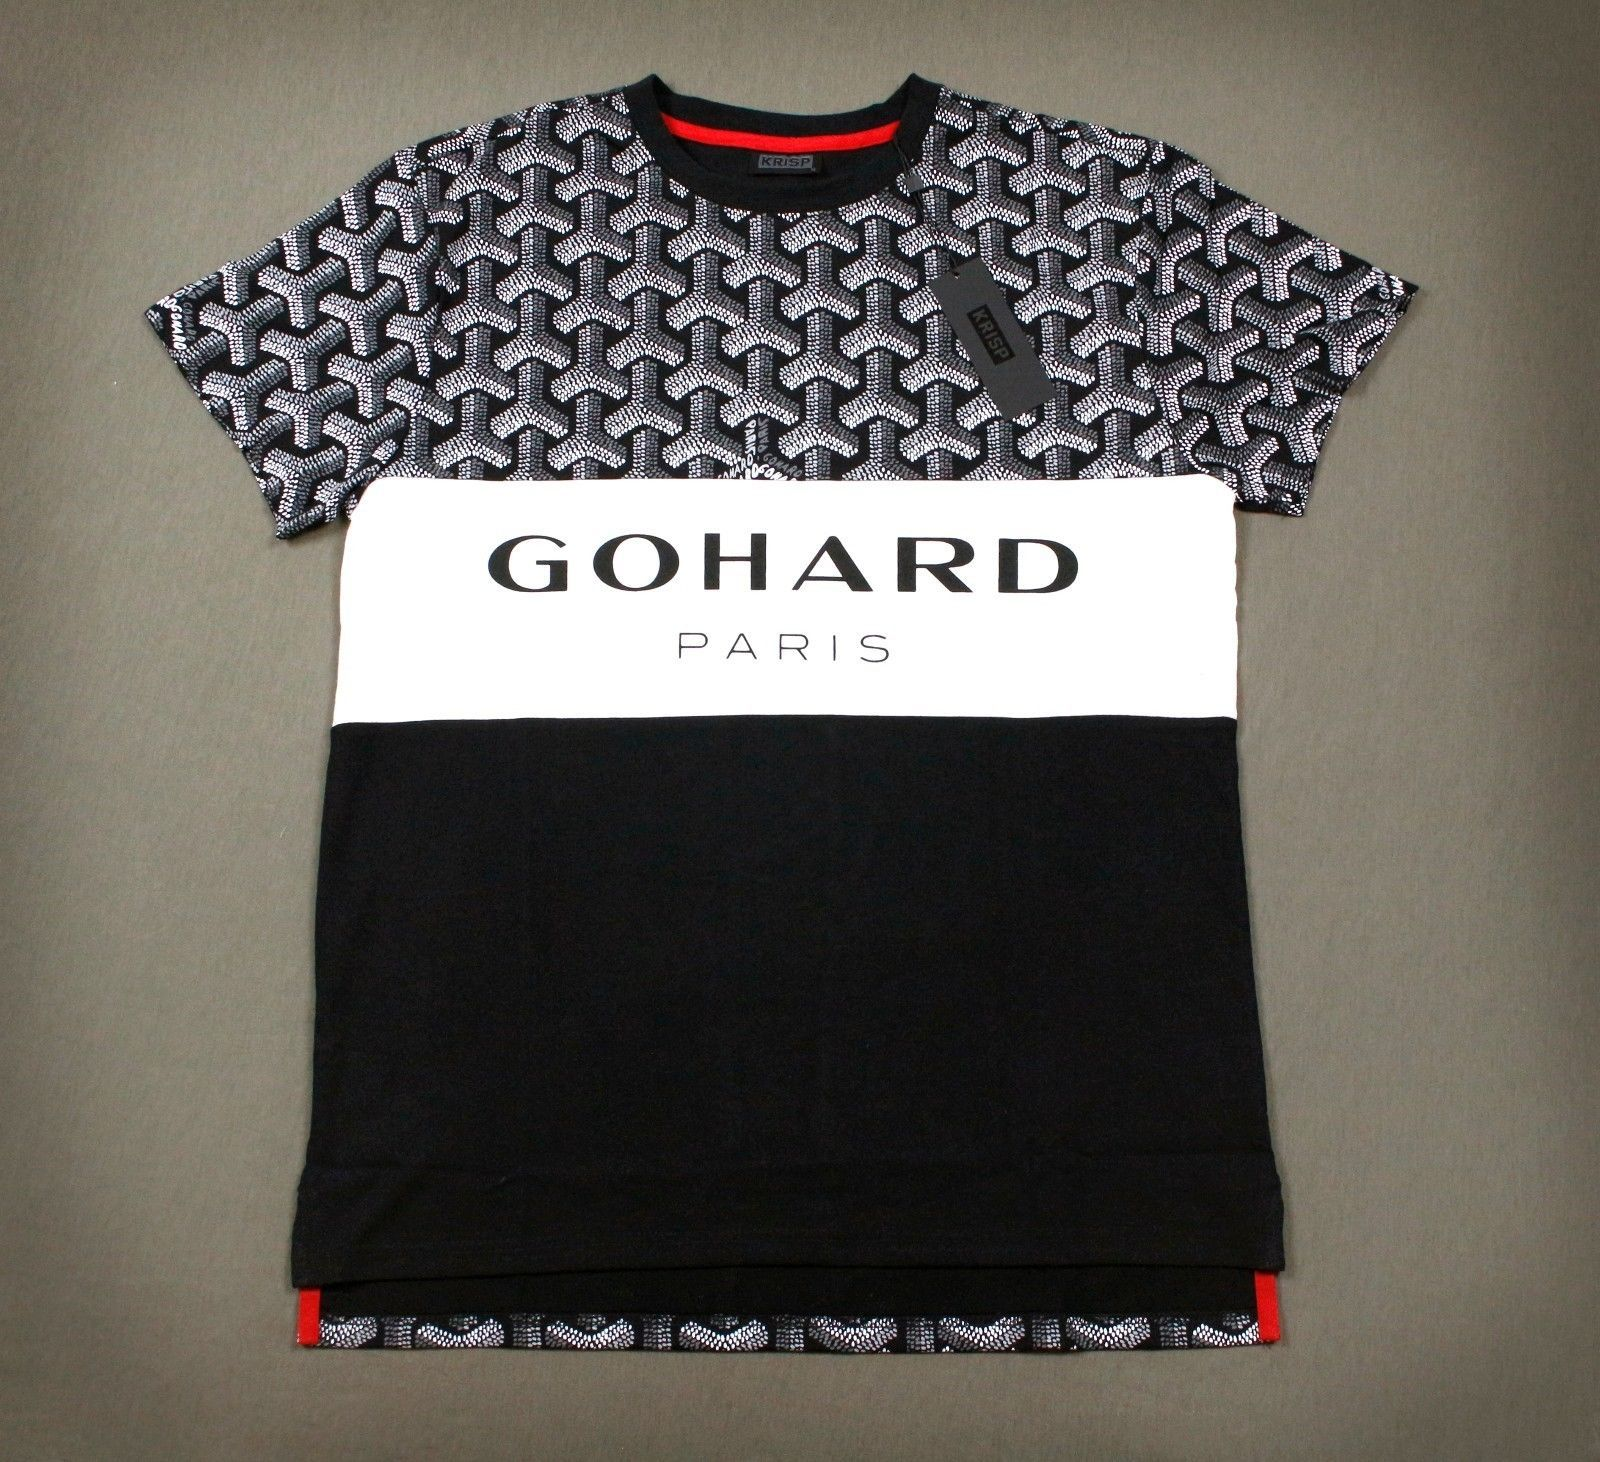 08aee6845 Men's Go Hard Paris Gucci Parody Goyard Print Tee Shirt M L XL 2X   Clothing,  Shoes & Accessories, Men's Clothing, T-Shirts   eBay!